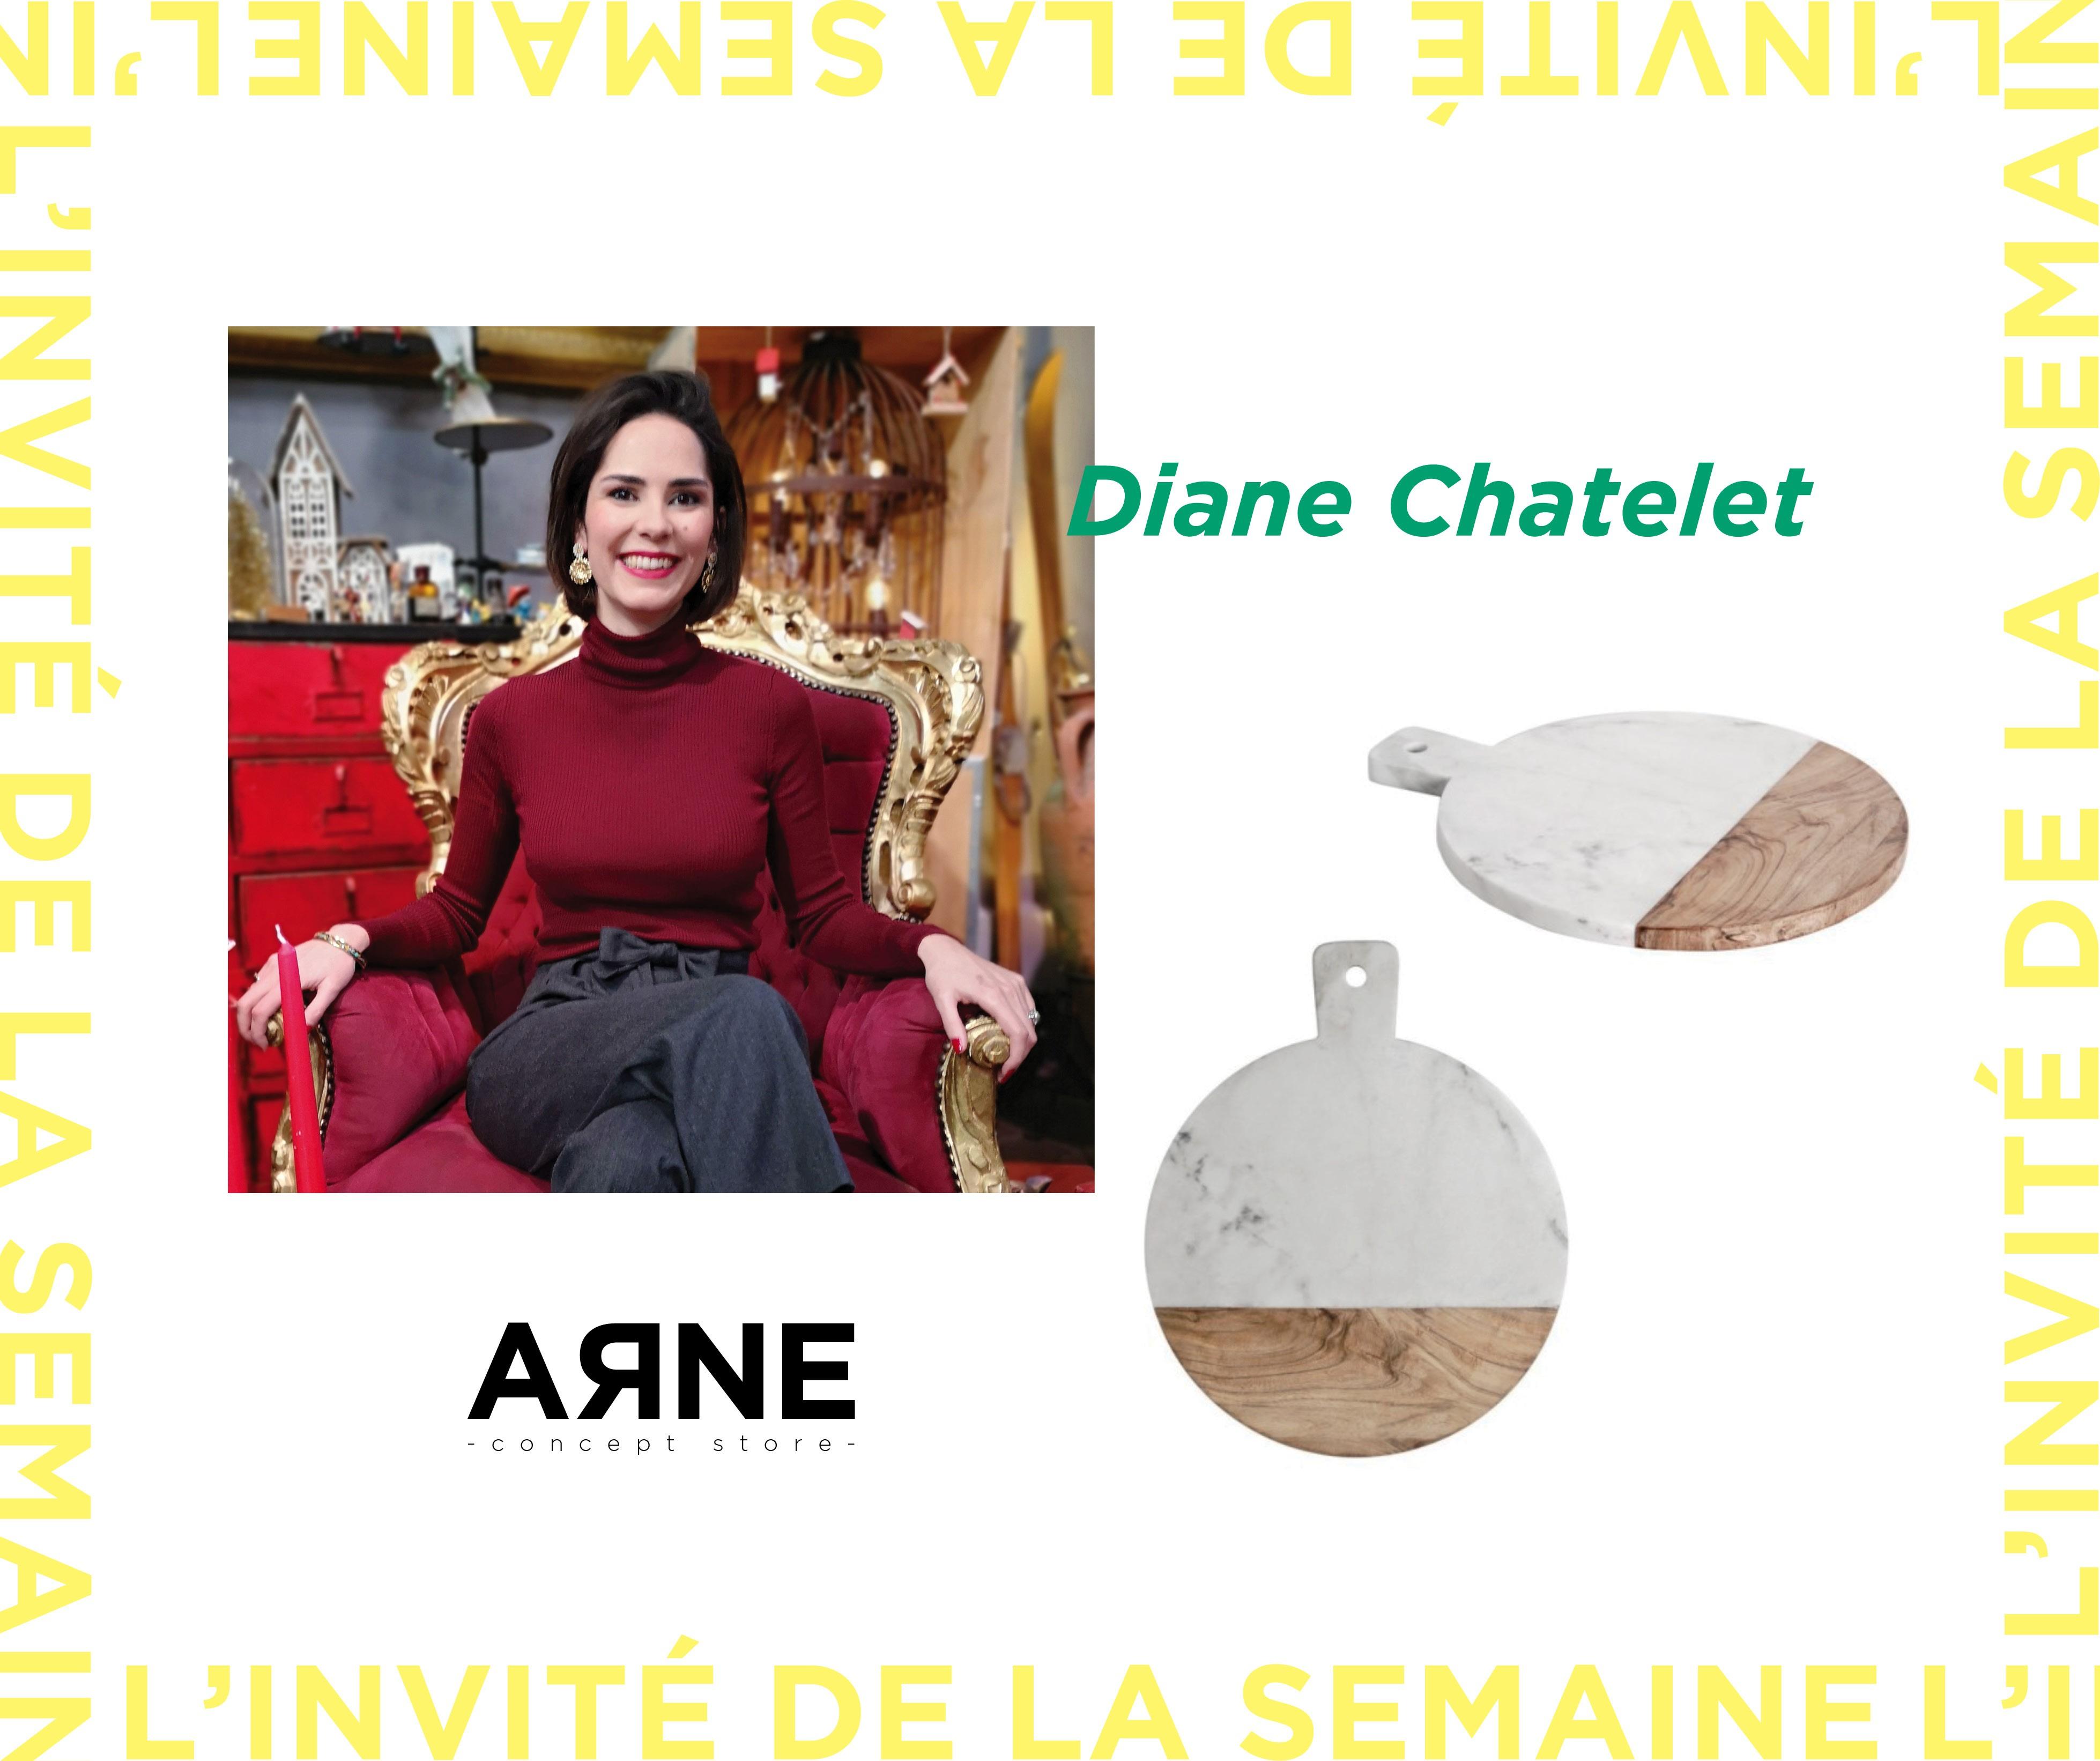 Une galeriste chez ARNE : Diane CHATELET !